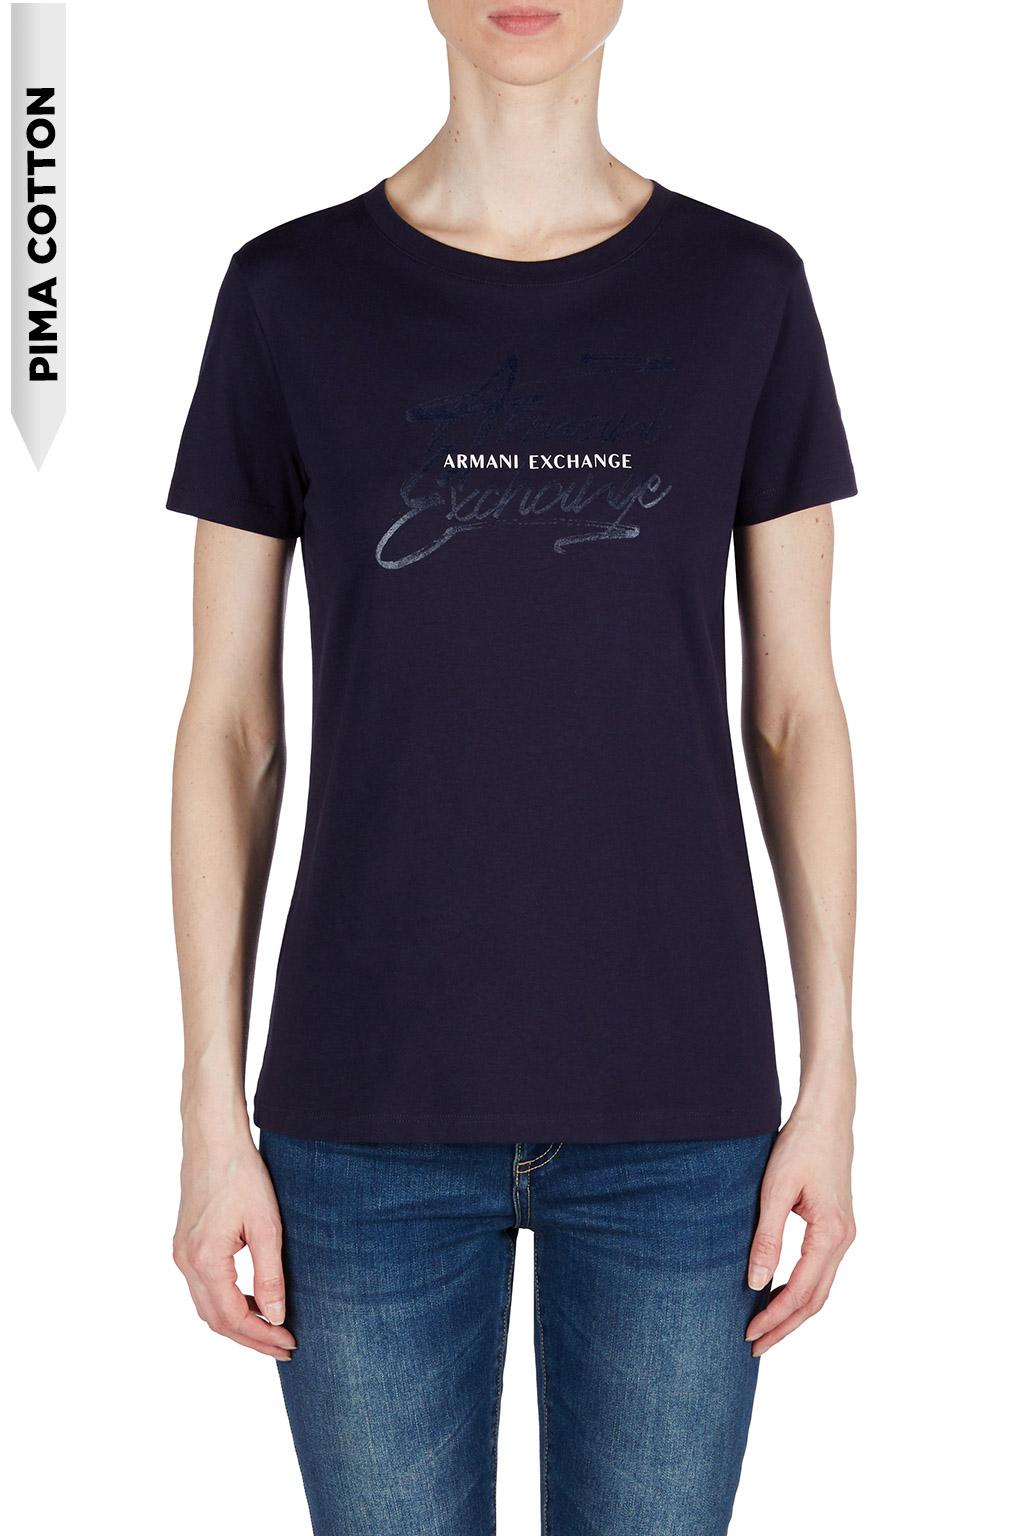 T-Shirt donna girocollo ARMANI EXCHANGE